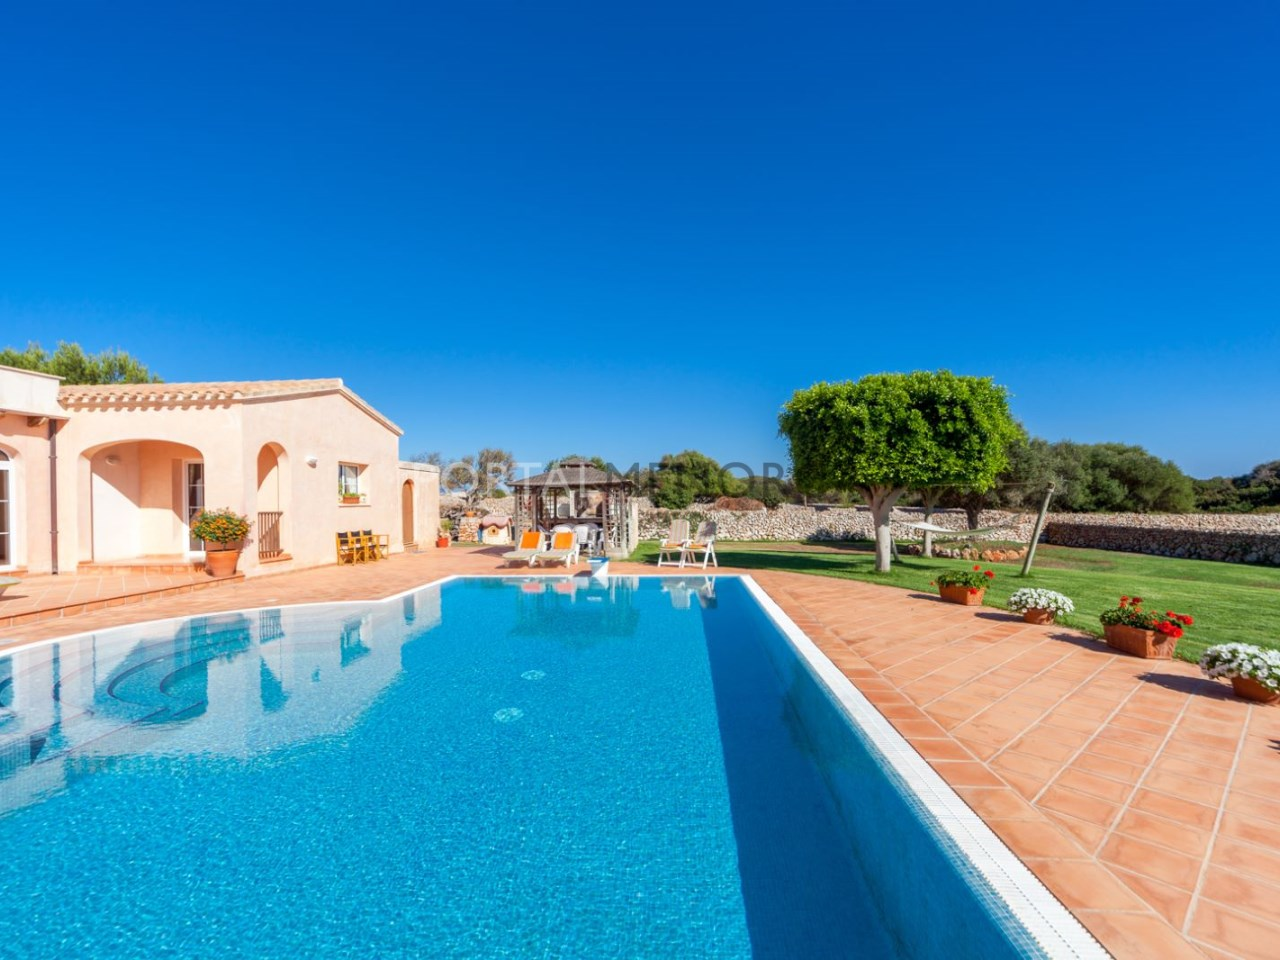 Casa de campo con piscina en Menorca (8 de 41)